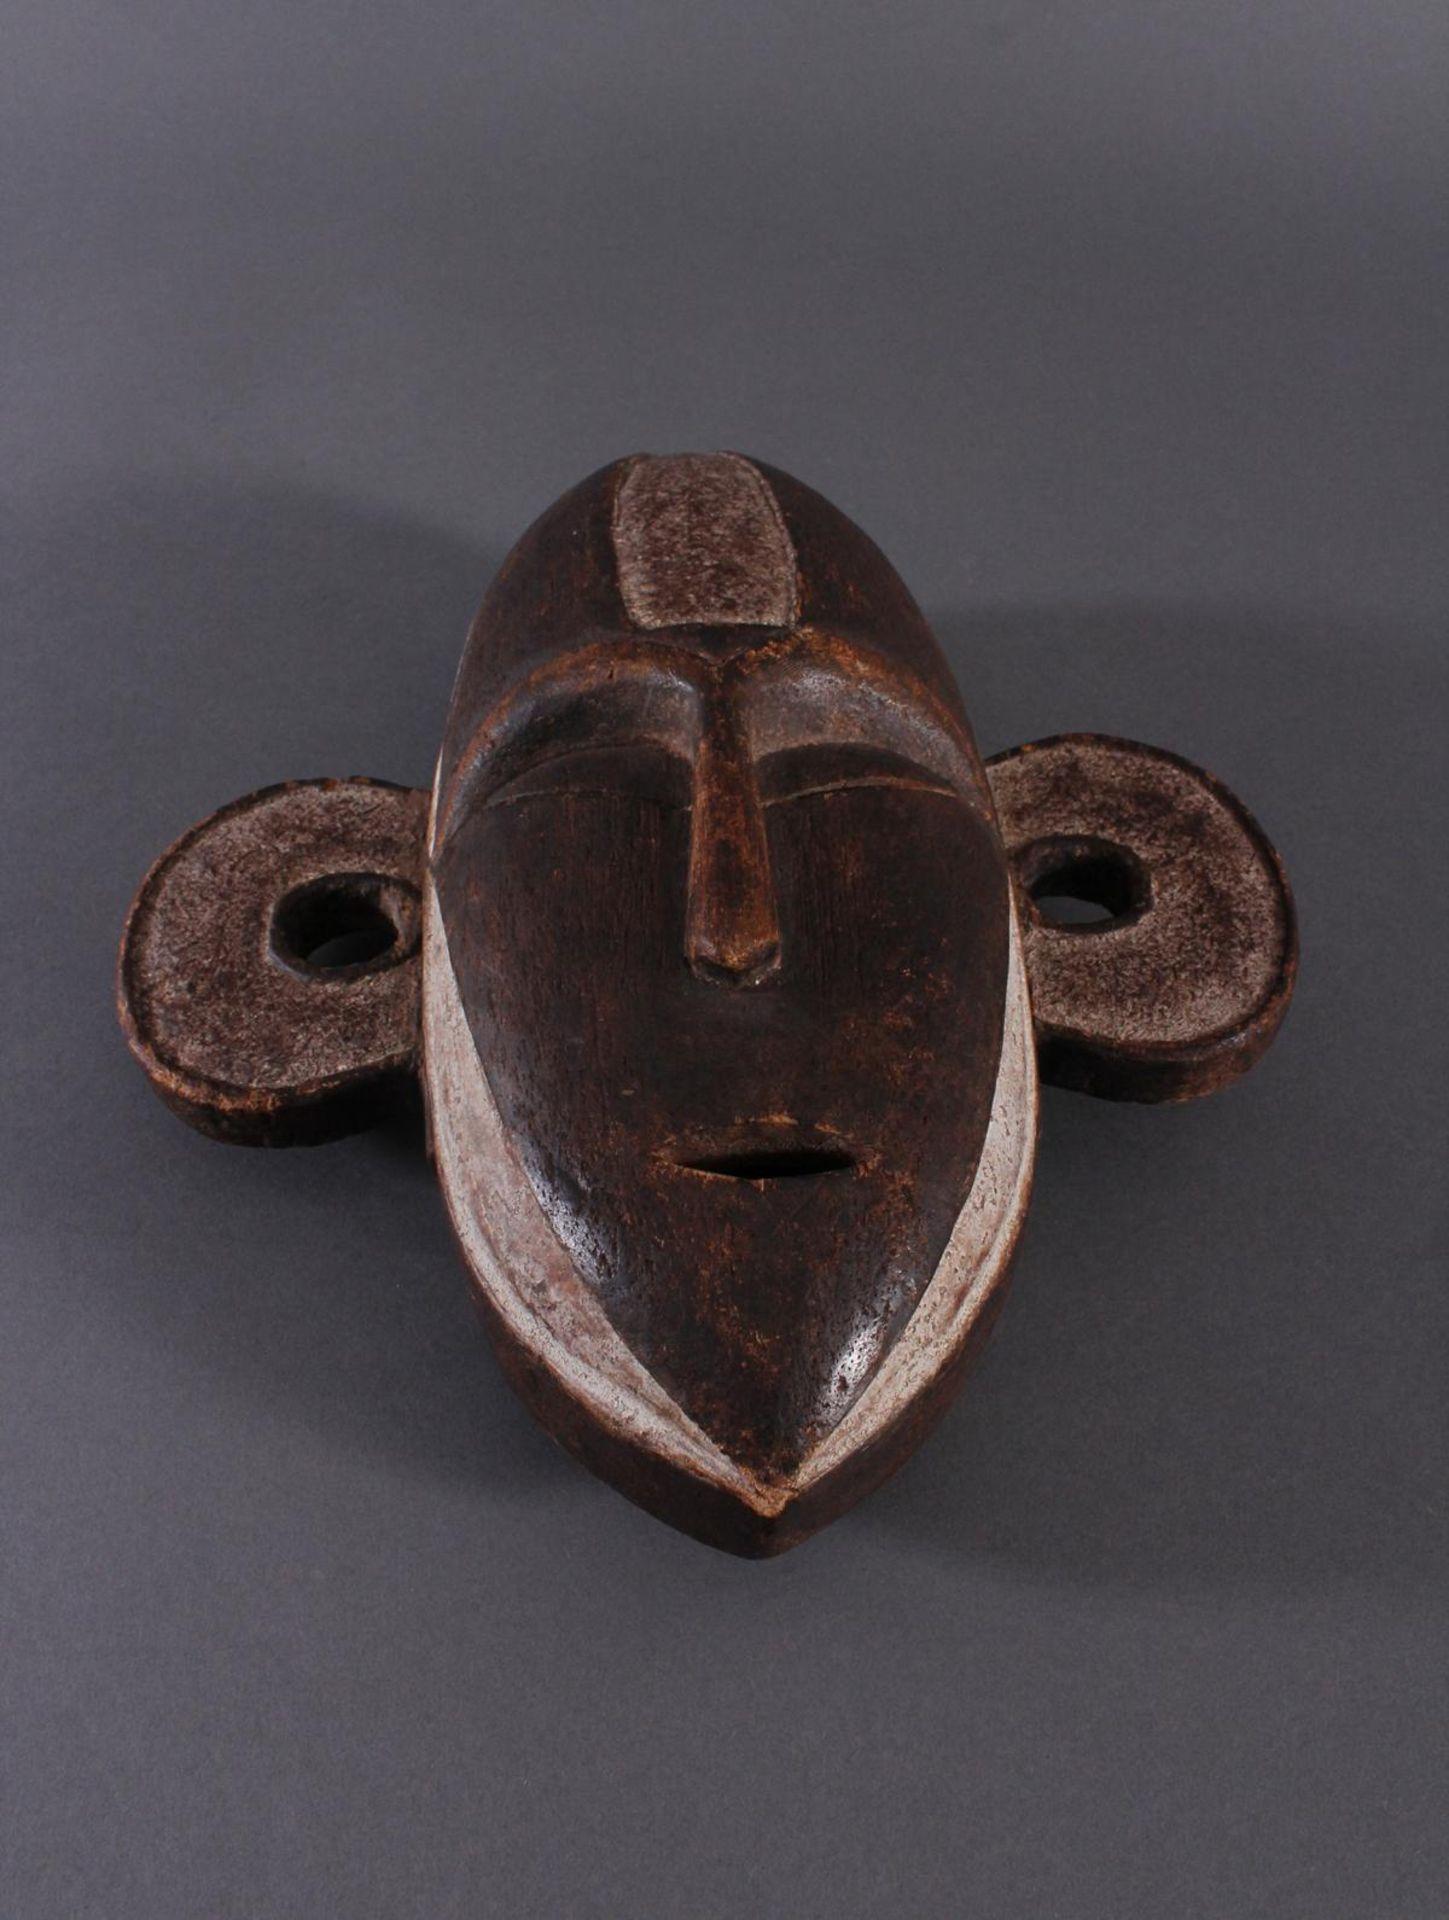 Antike Maske, Boa, Kongo 1. Hälfte 20. Jh.Holz geschnitzt, dunkle Patina, Reste weißer Bemalung, - Bild 2 aus 6